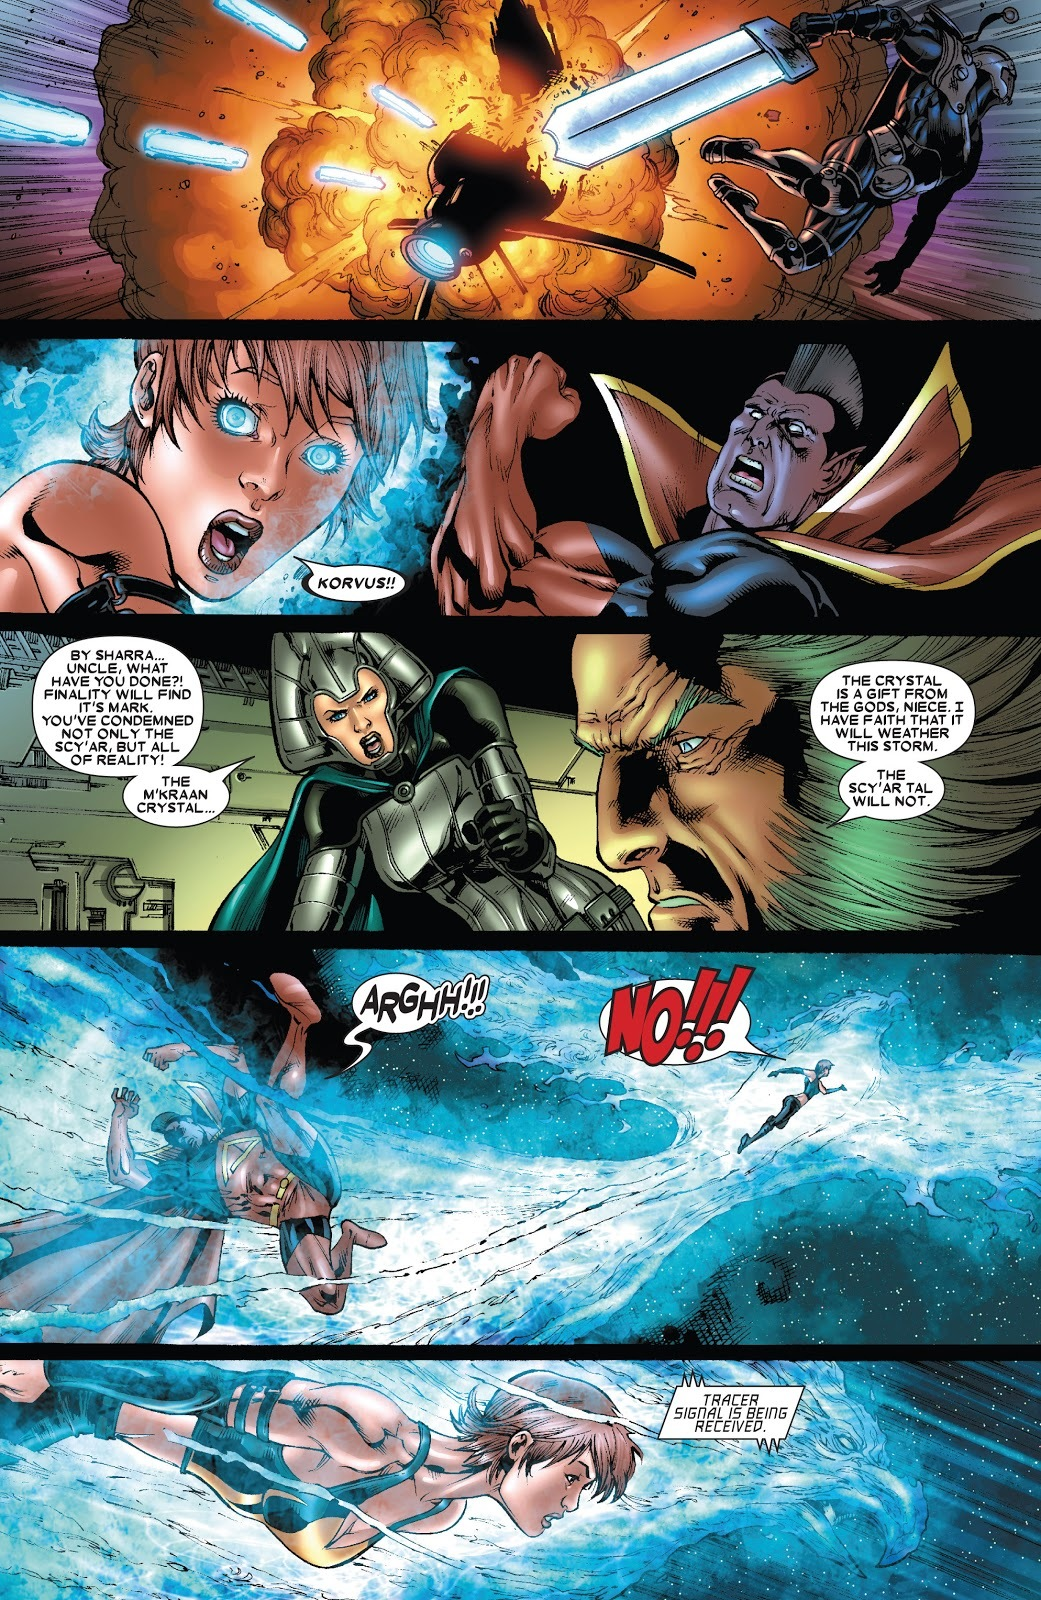 After her partner Korvus is injured Rachel races toward him knocking Gladiator back in the process